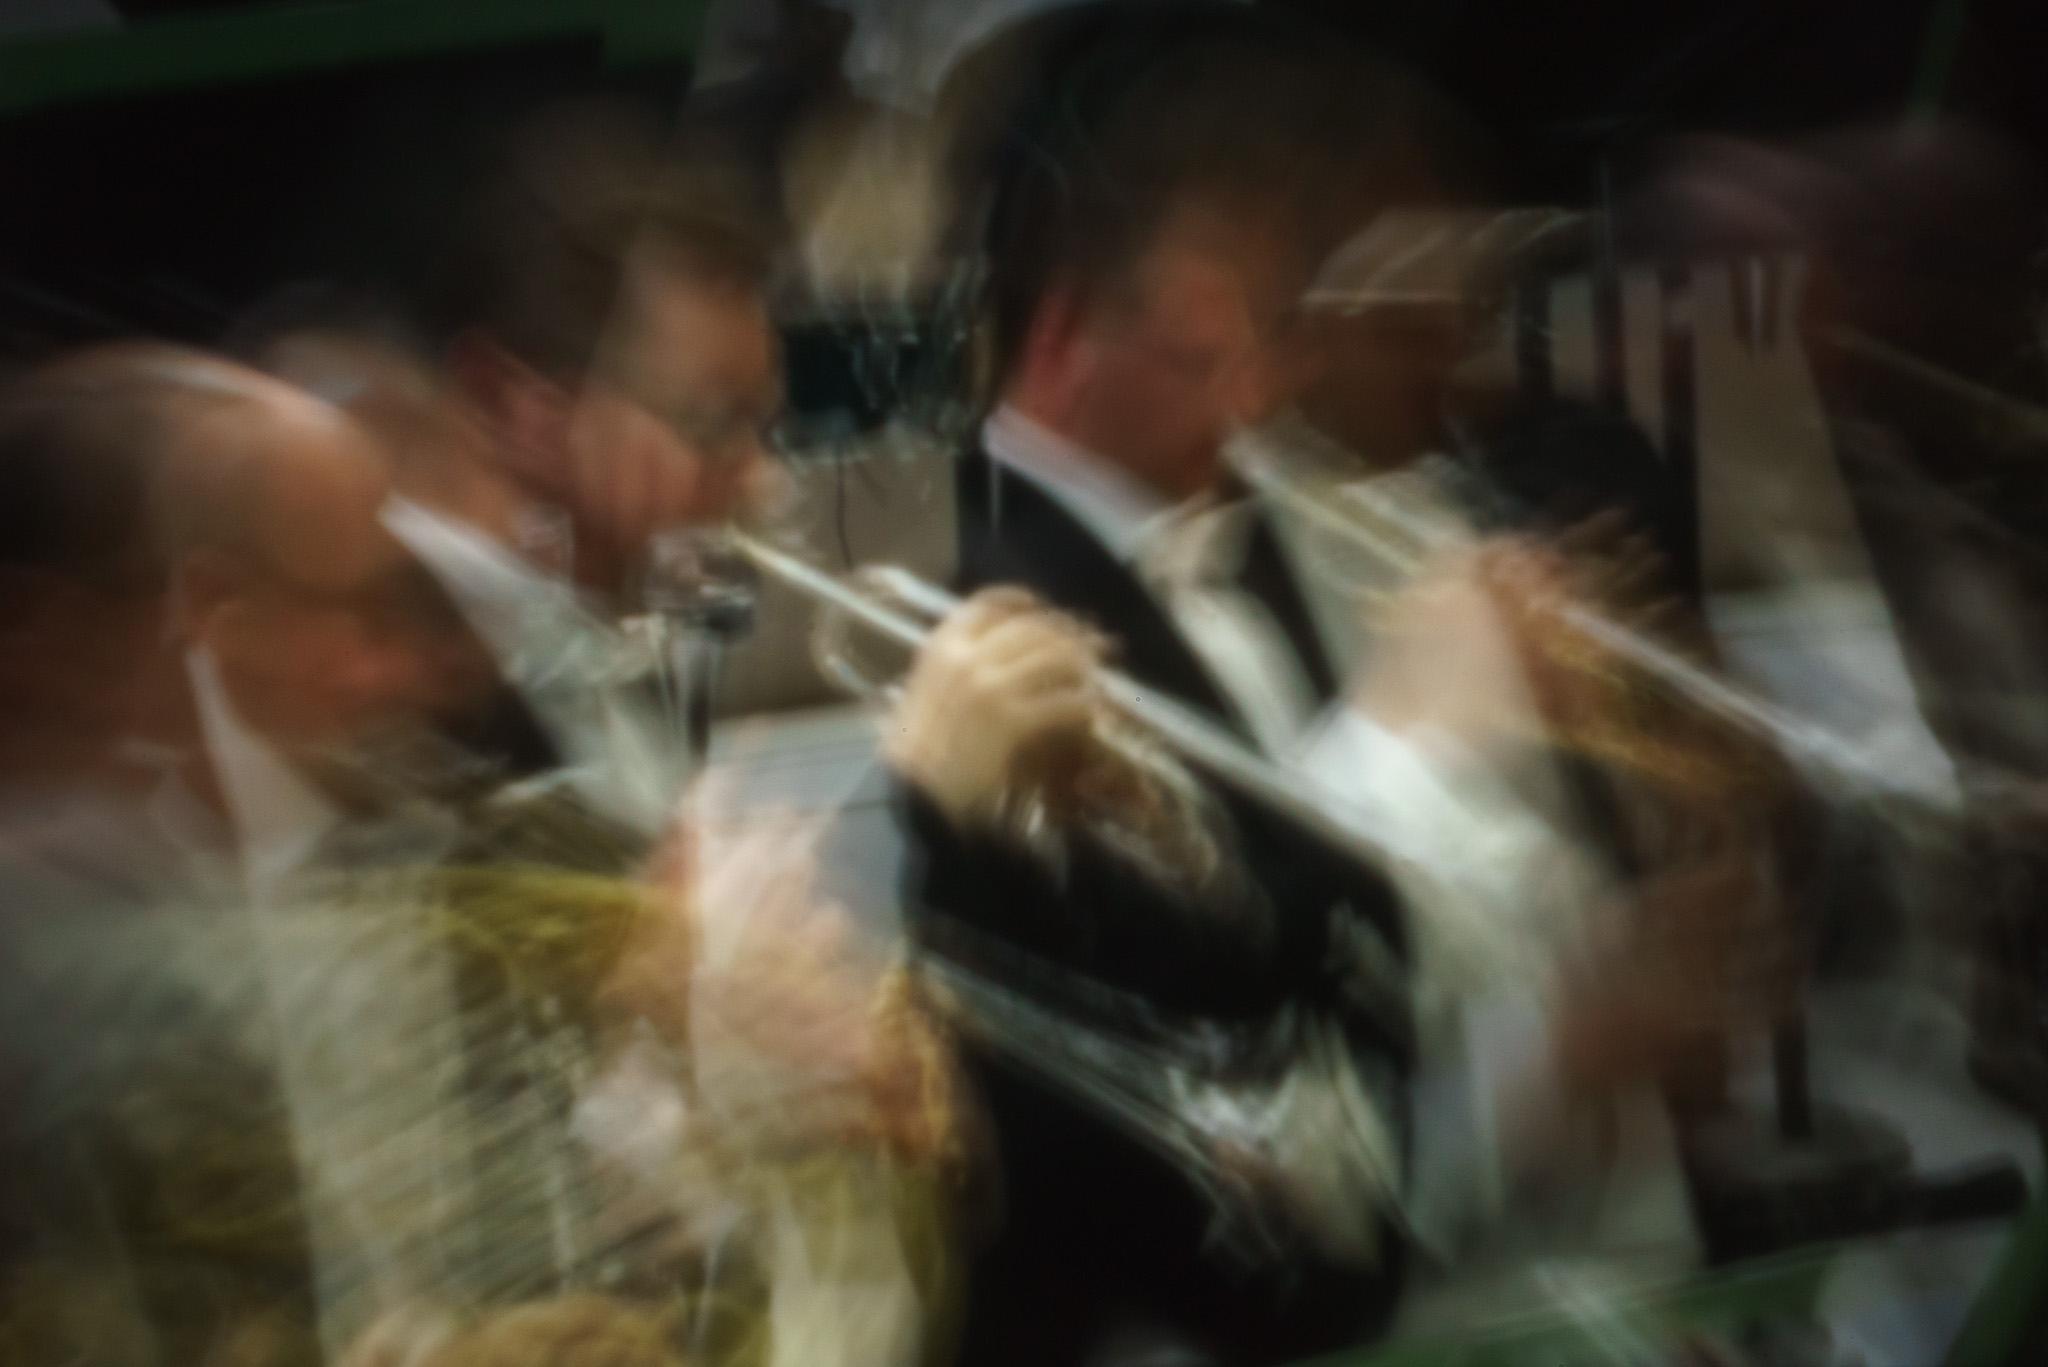 Concerto_Grosso_(10_von_16)